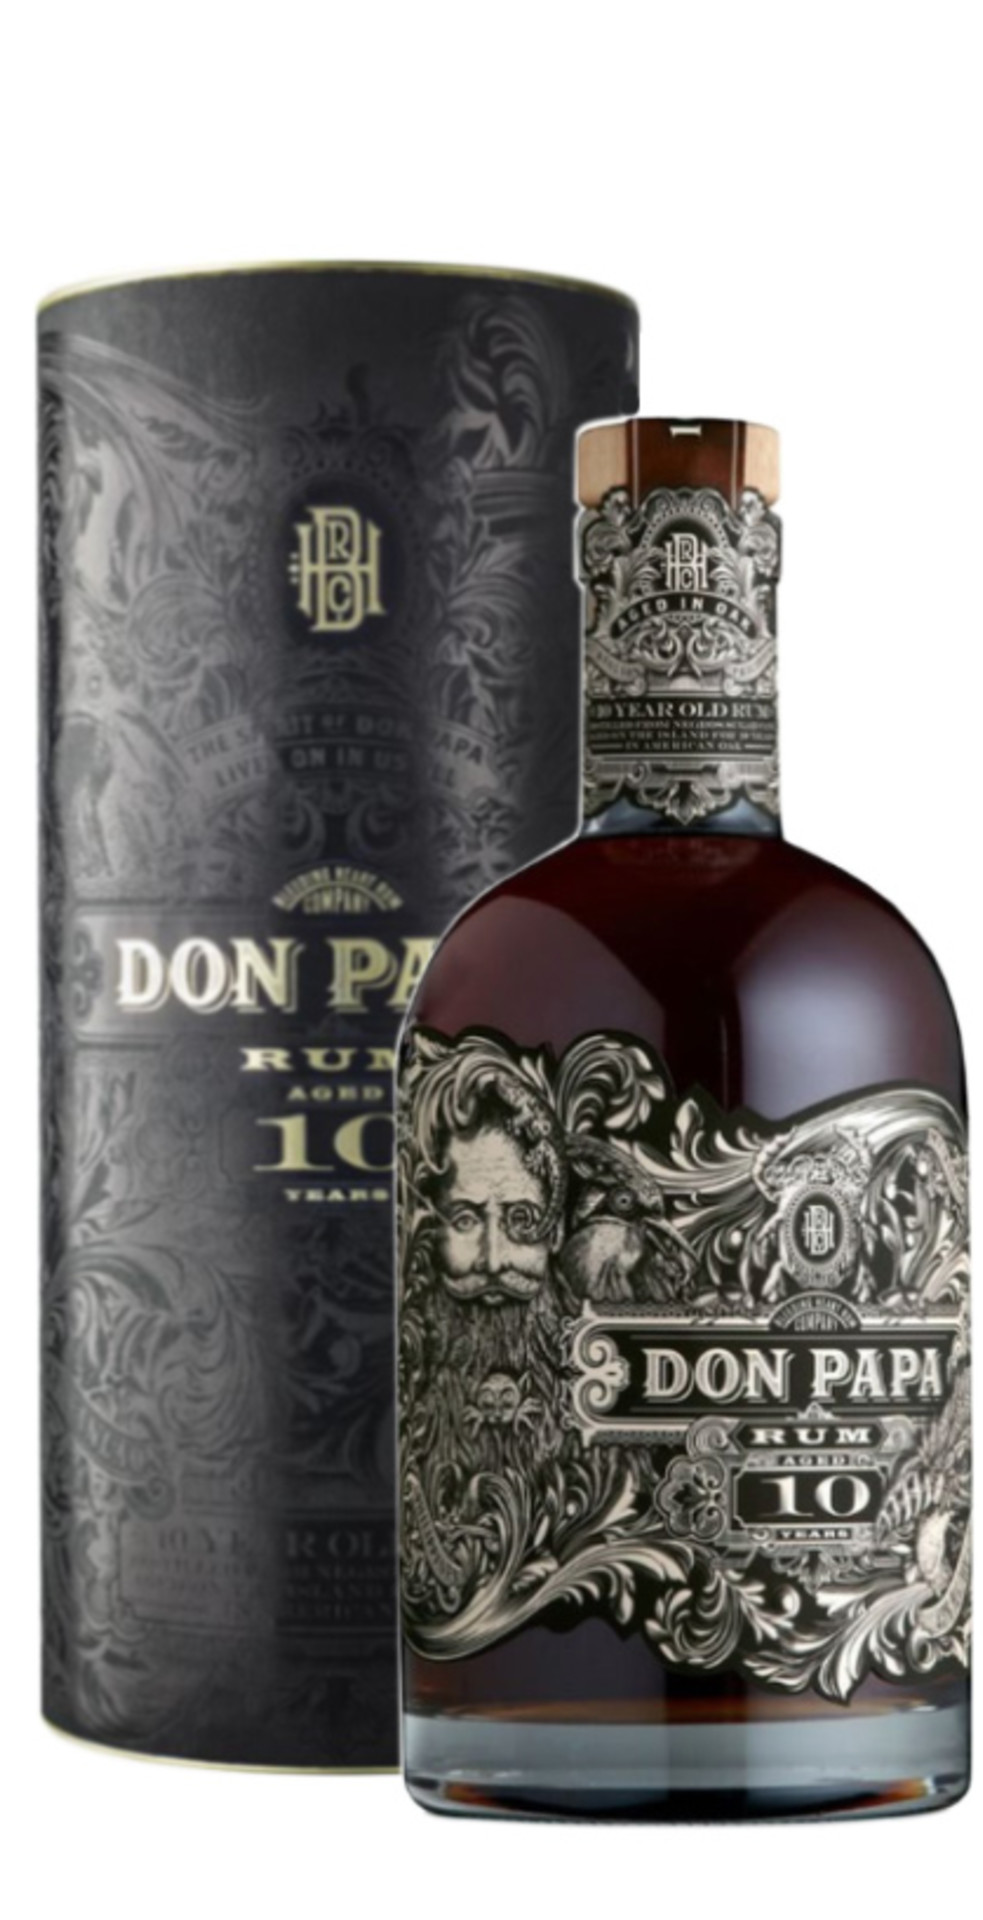 rum-don-papa-10-anni_7409_zoom.jpg